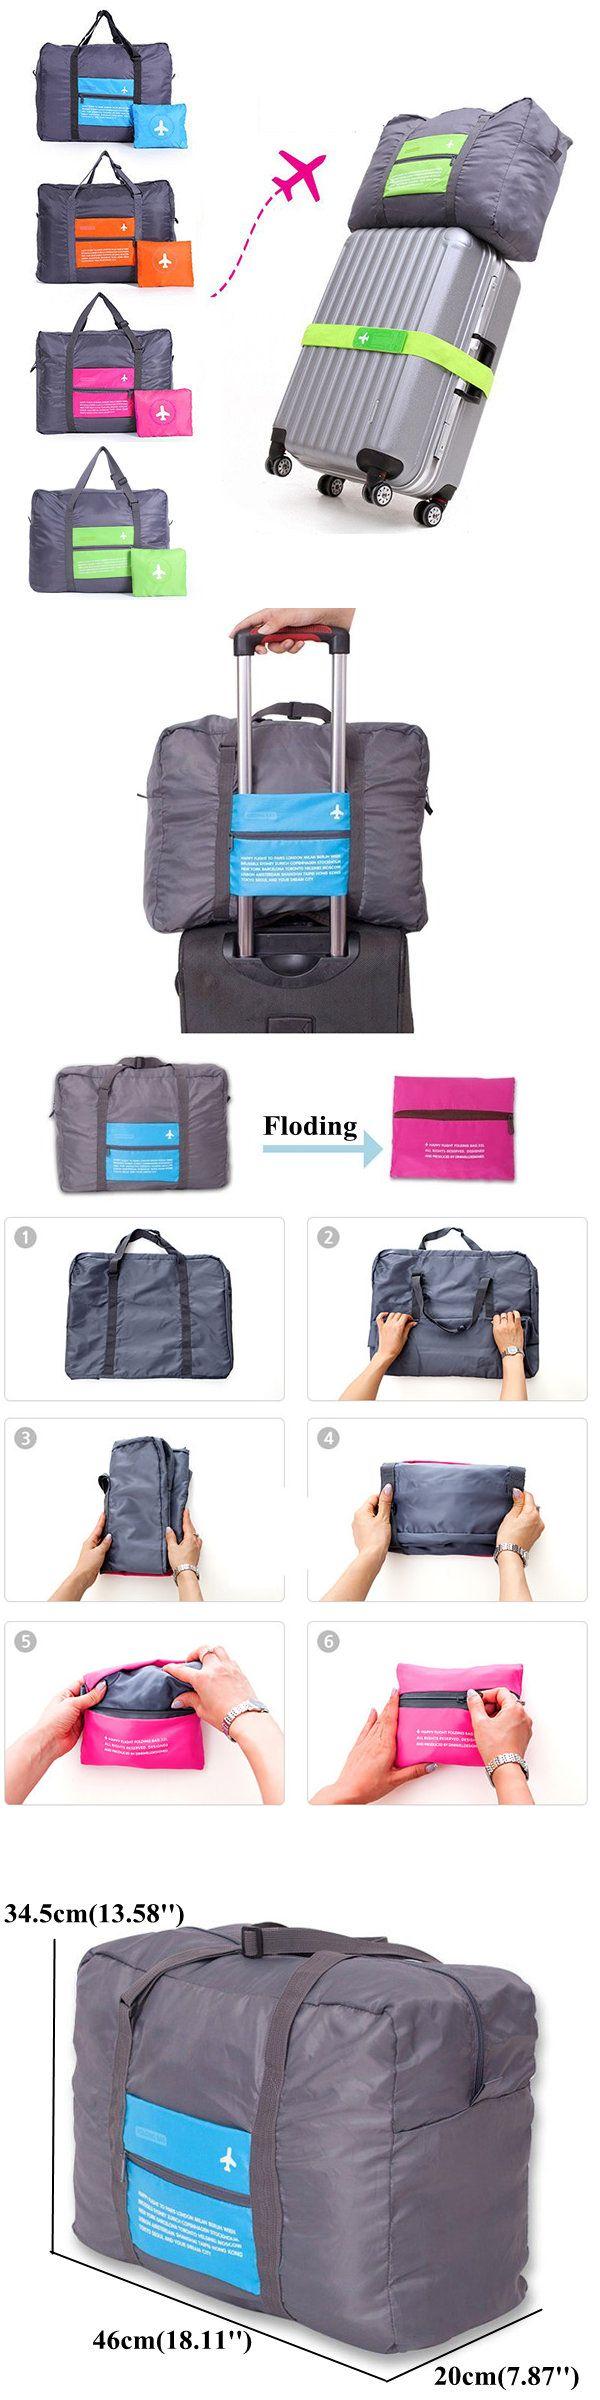 US$6.89 Four Colors Nylon Folding Large Capacity Travel Bag Storage Bag